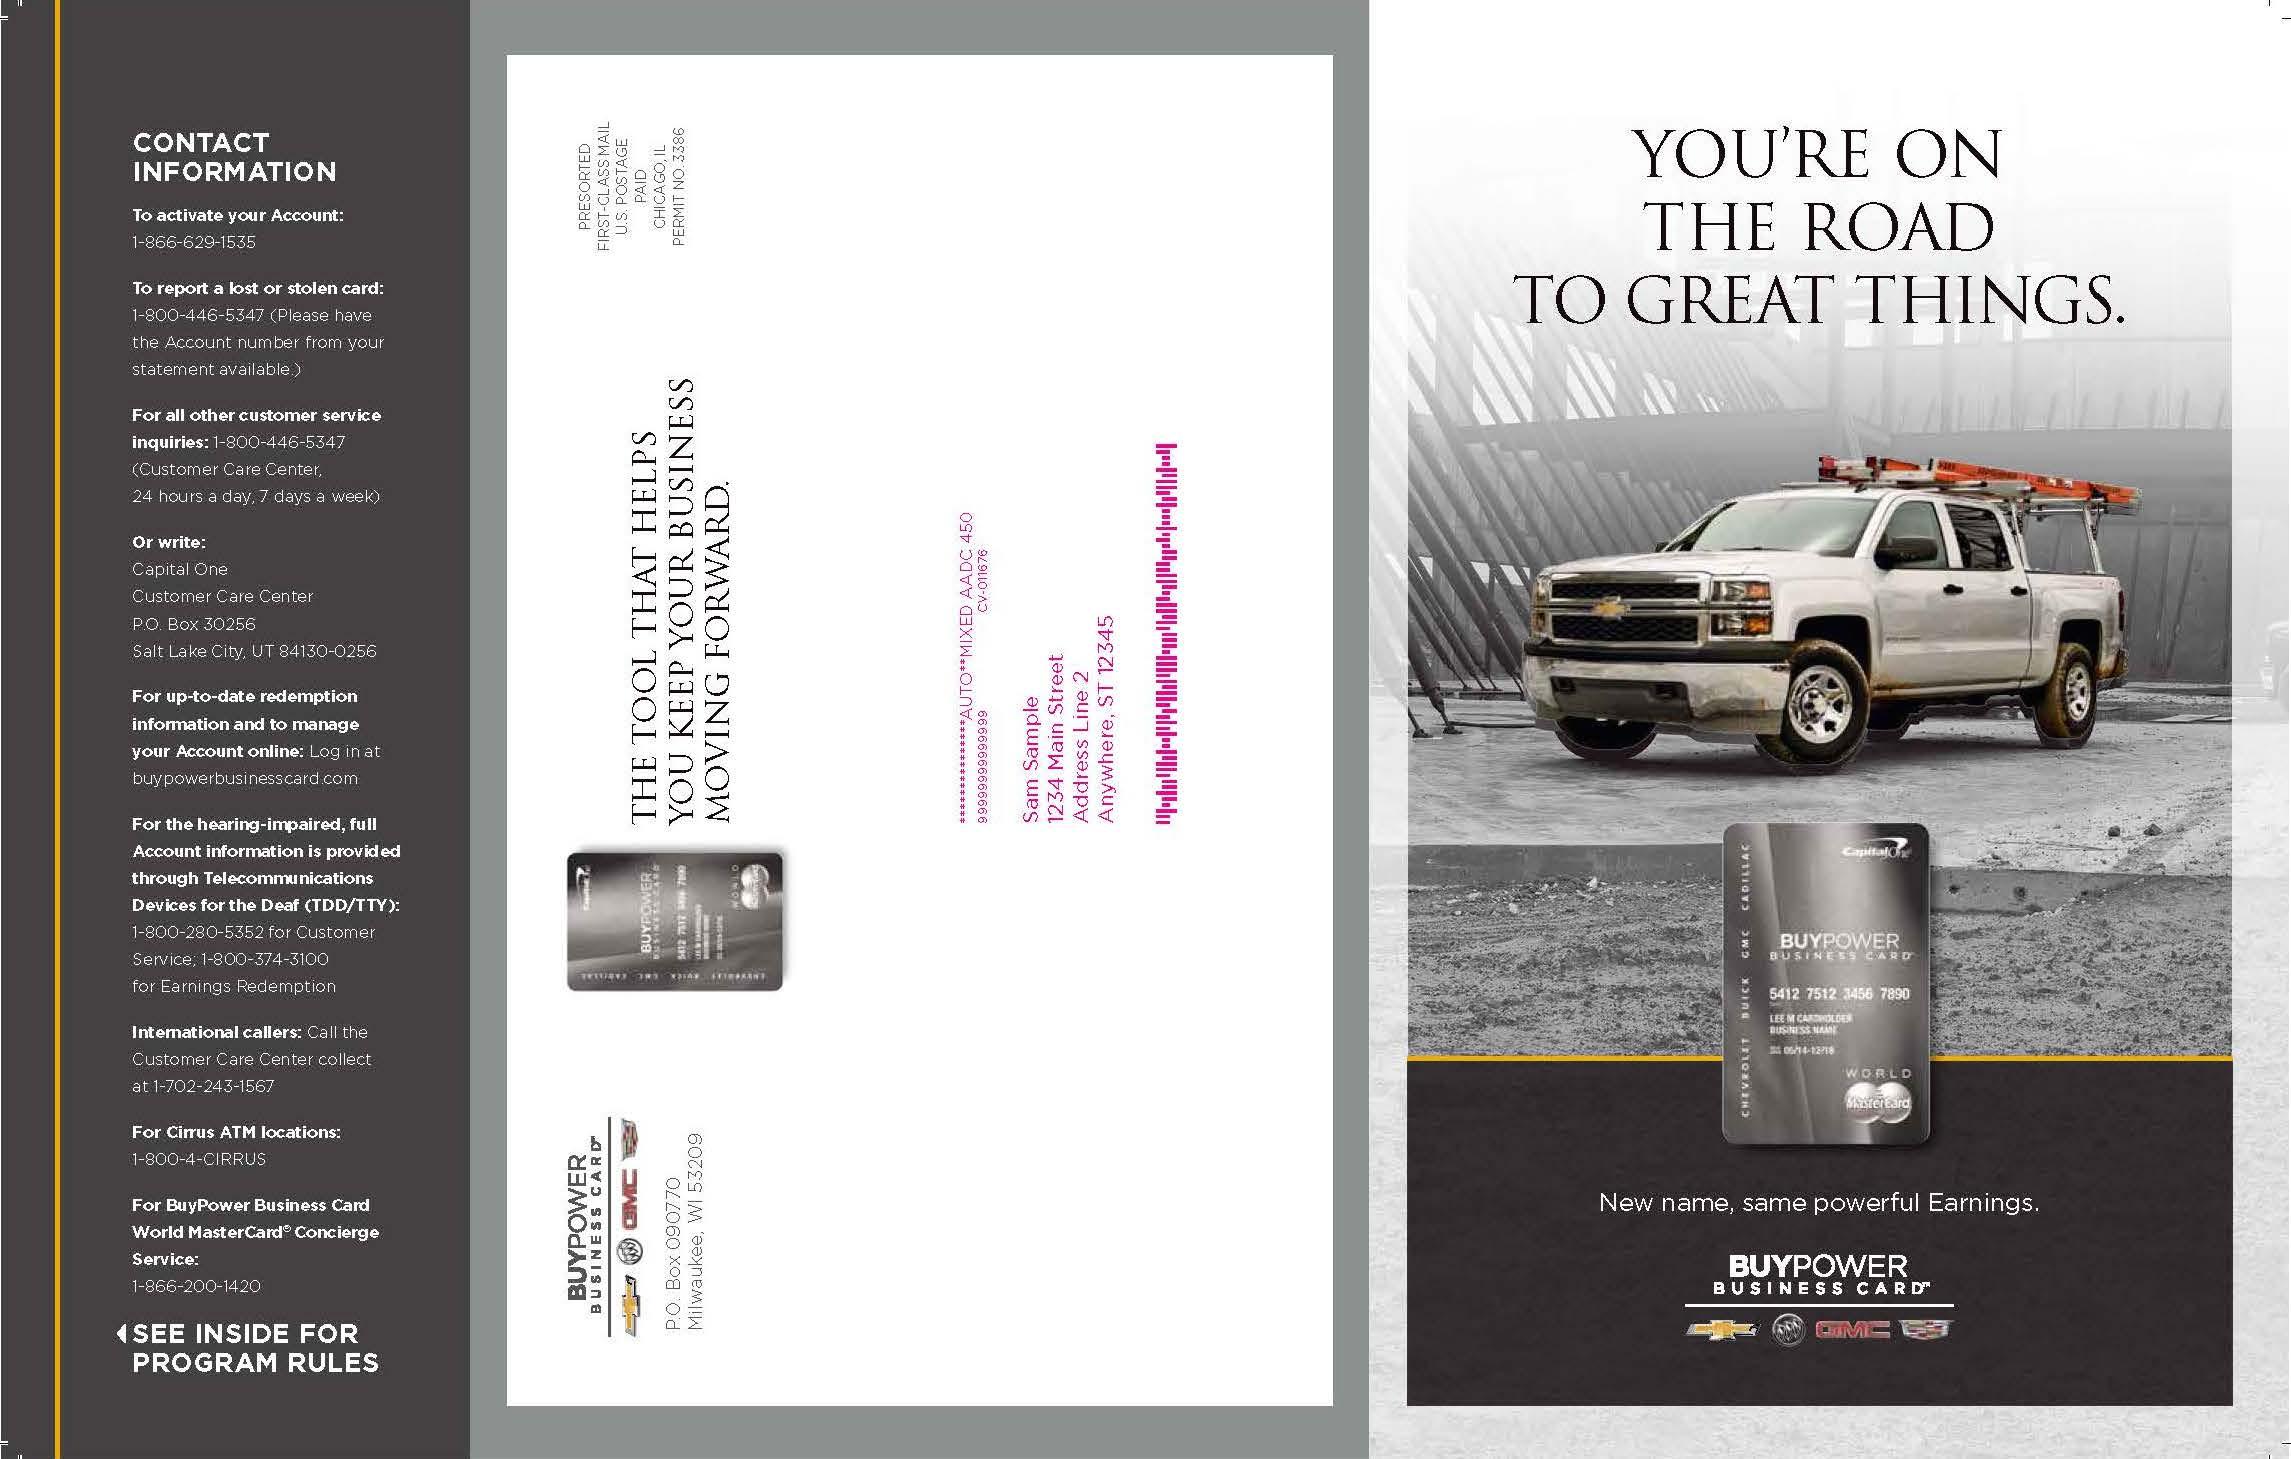 power business card brochure by stephanie fujiwara at coroflot